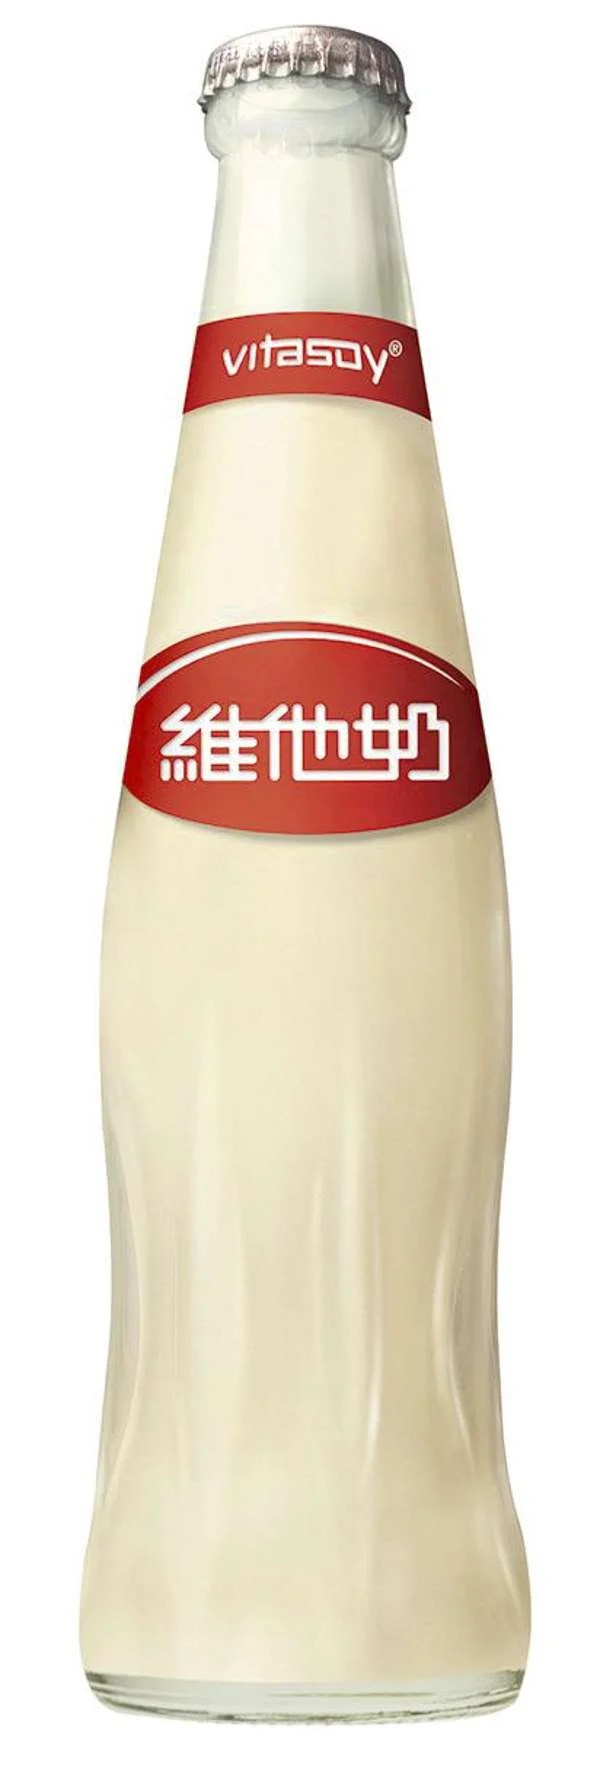 A modern Vitasoy bottle. Photo: courtesy of Vitasoy